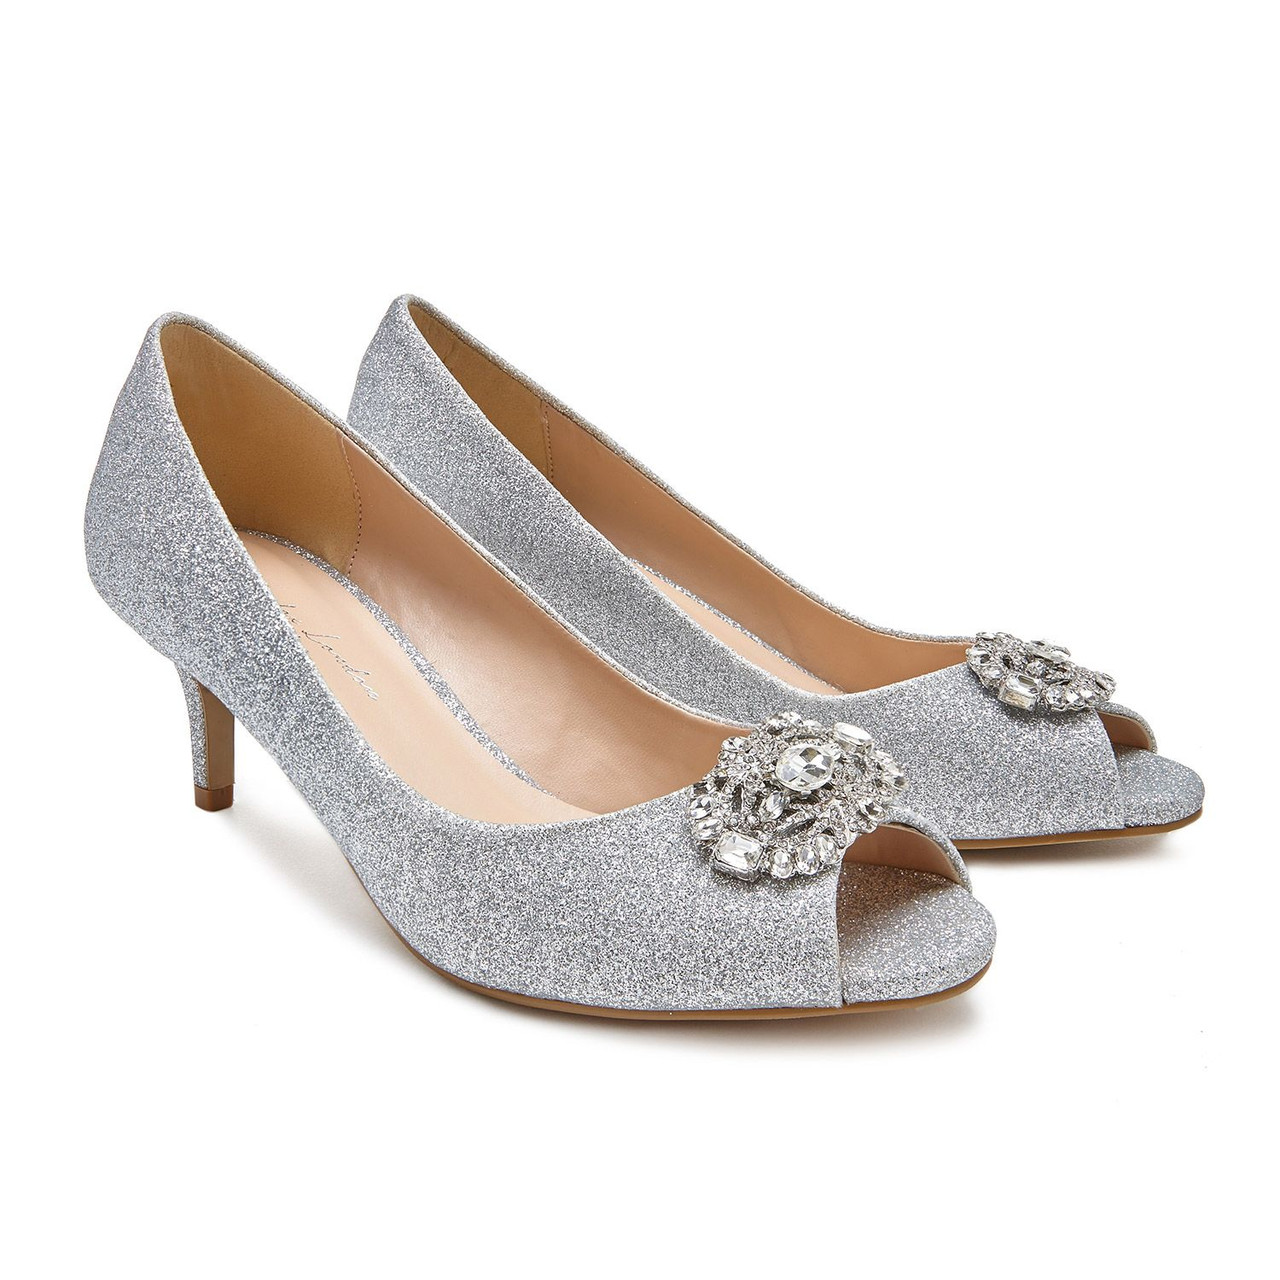 Paradox London Prunella Silver - Pink Collection - Standard Medium Size